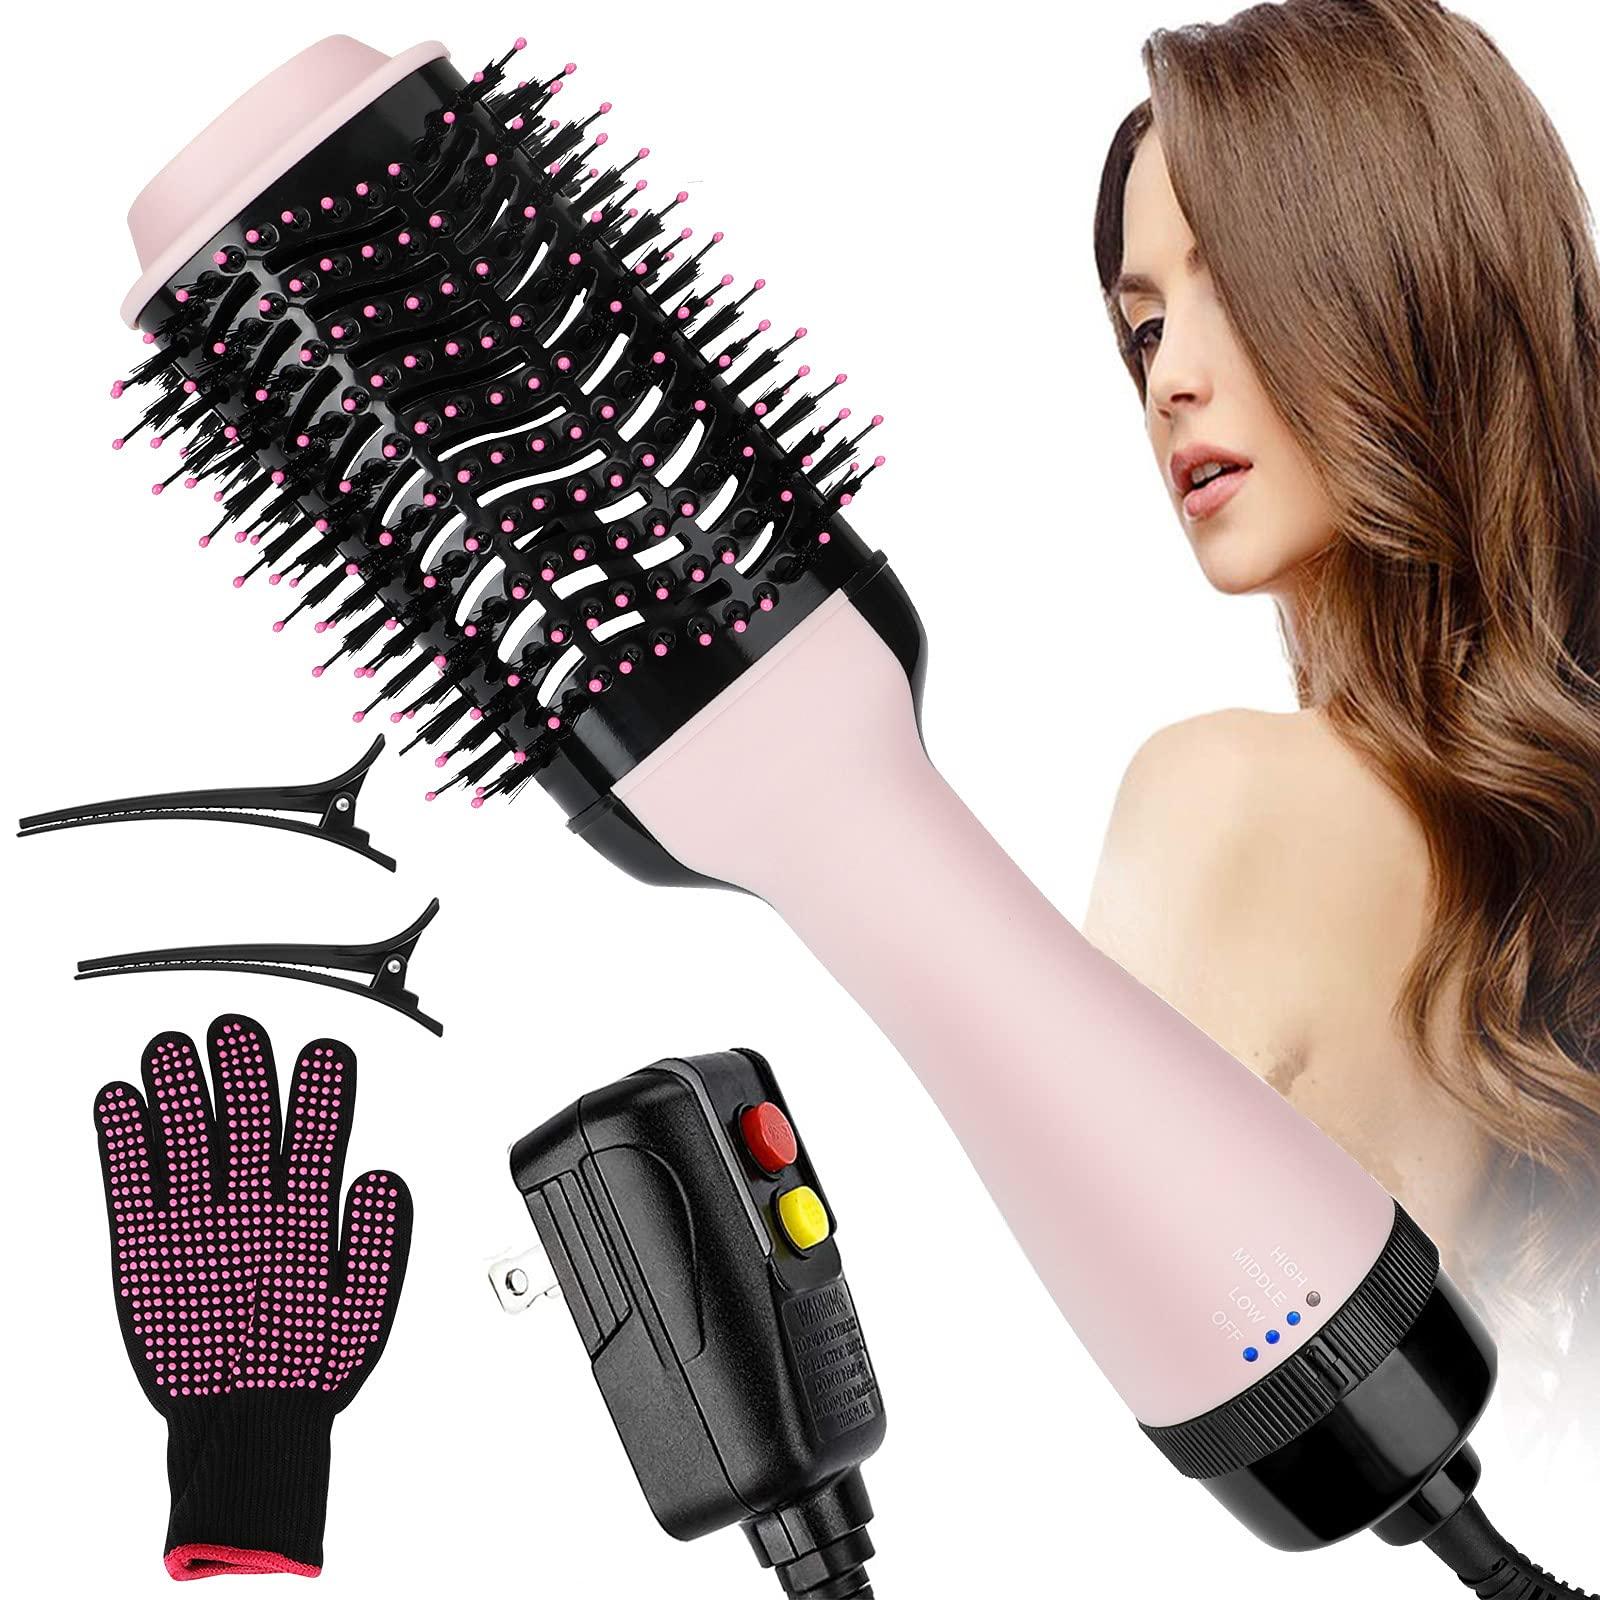 Blow Dryer Brush One Step MANLI Hair Dryer Brush 4 in 1